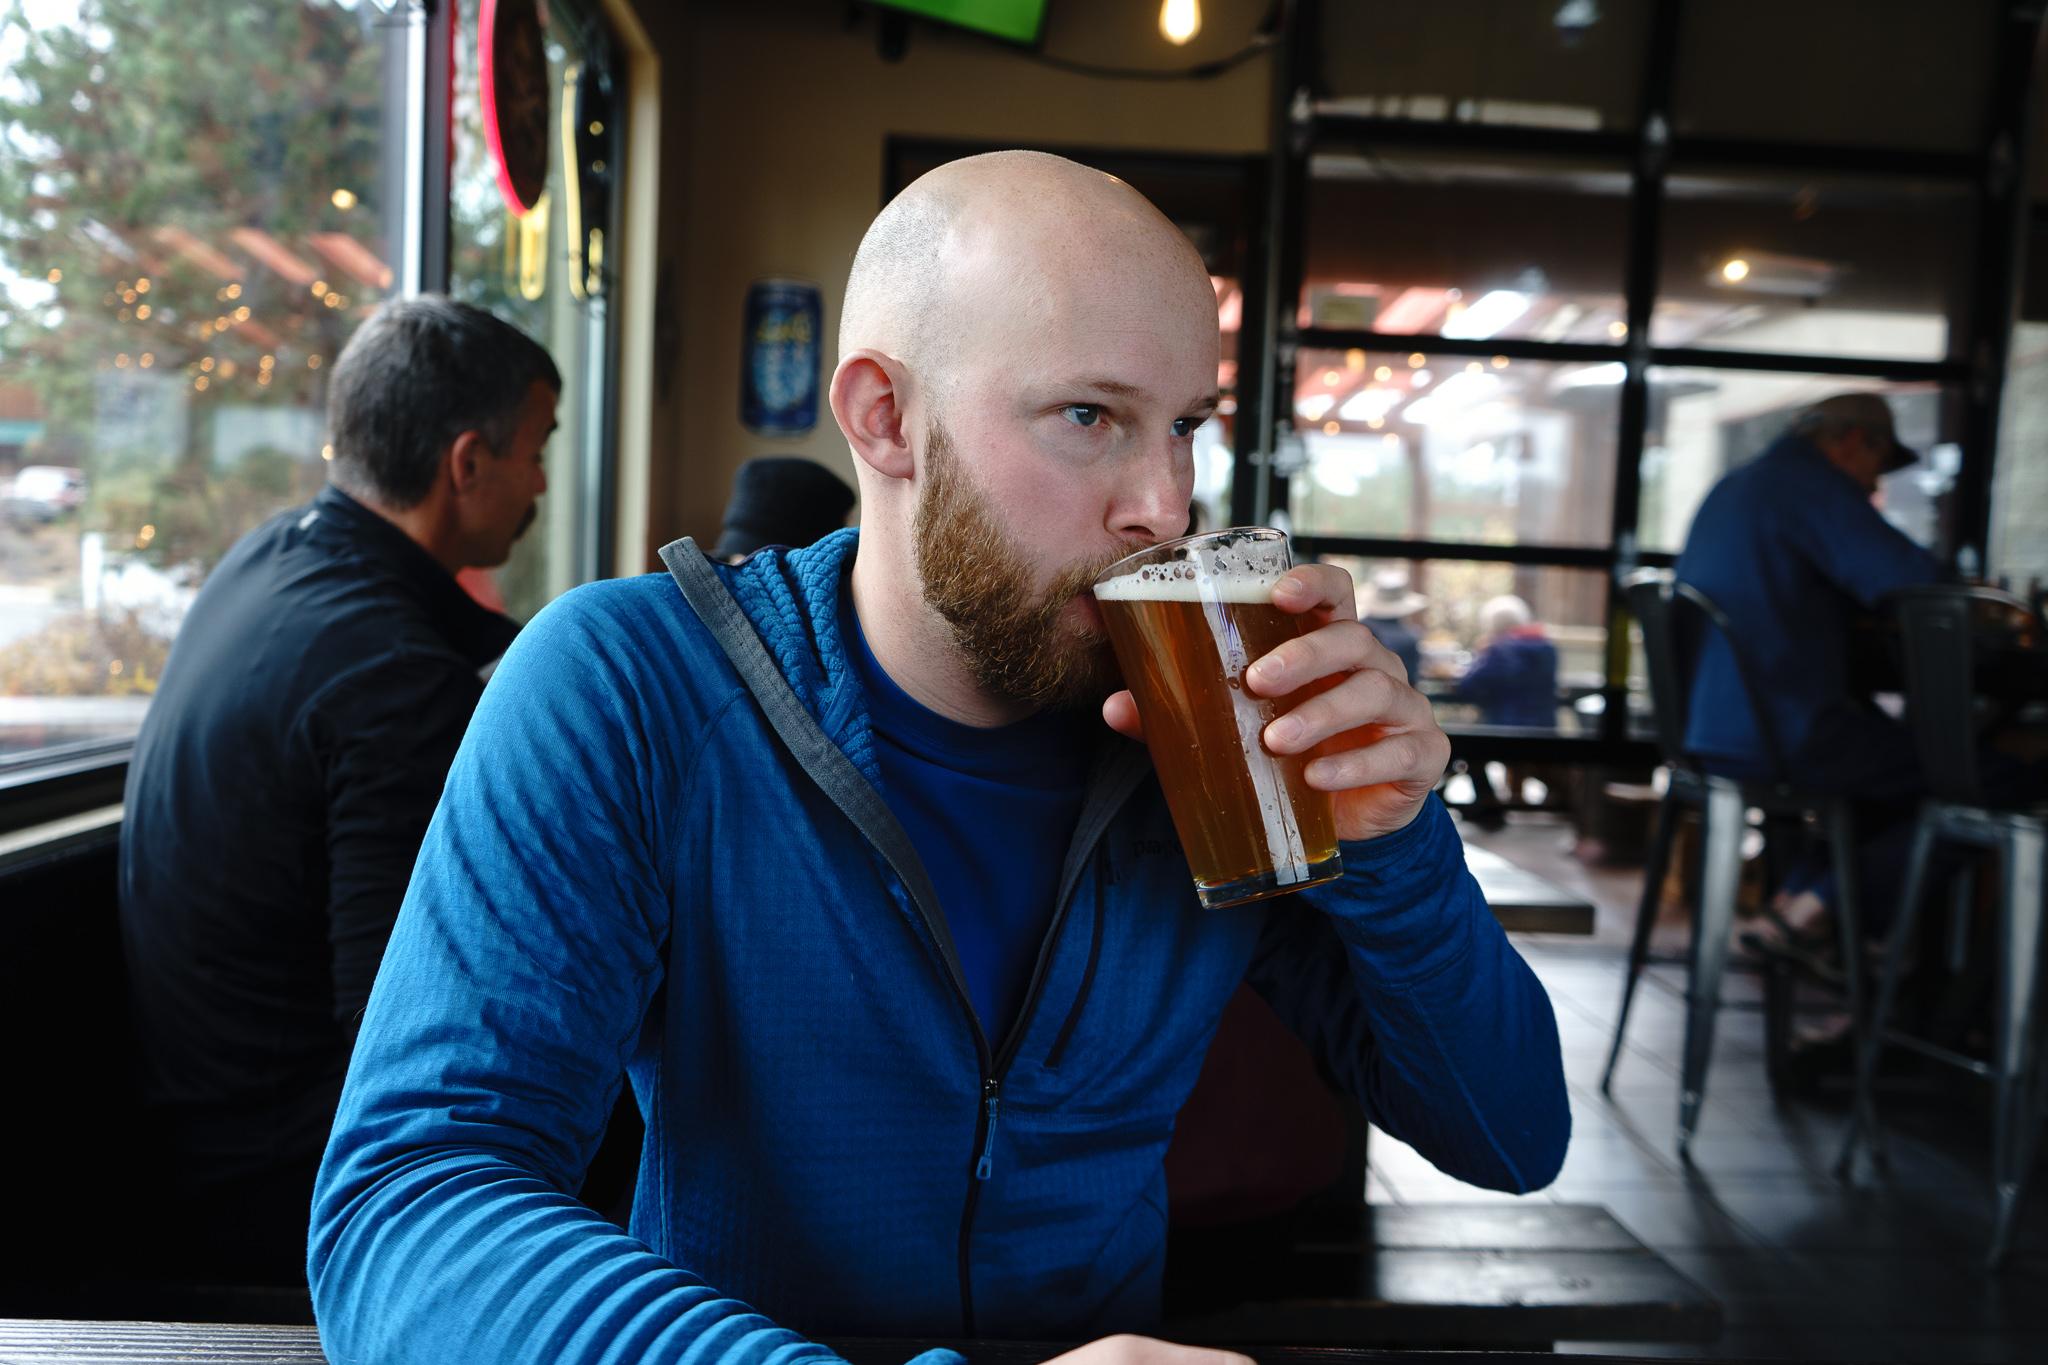 Bend, Oregon - Beer, beer and more beer